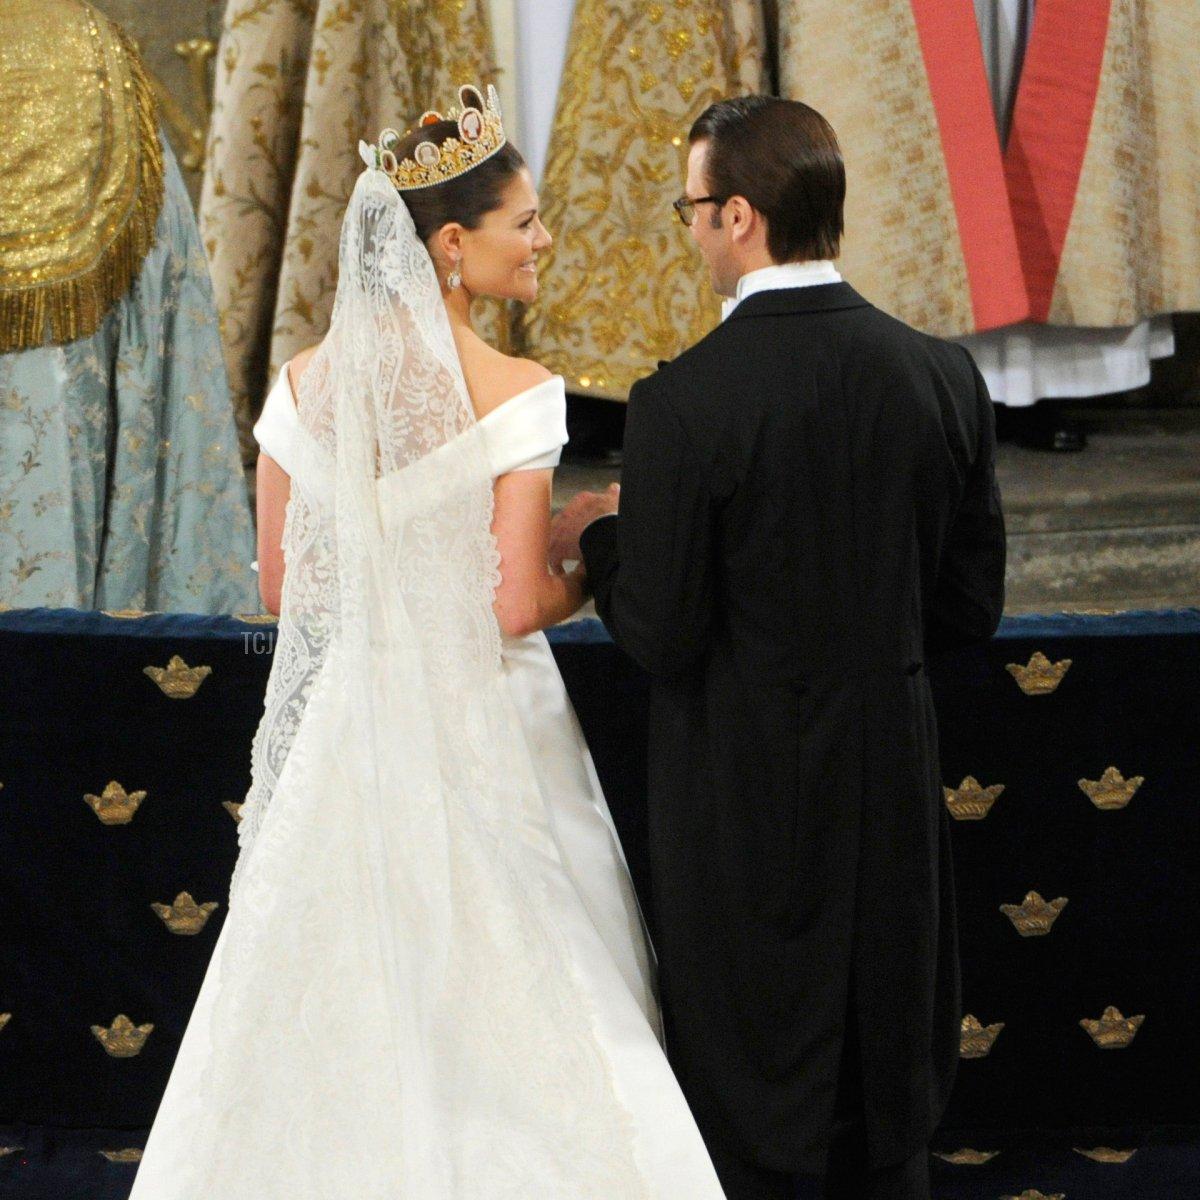 Crown Princess Victoria of Sweden, Duchess of Västergötland, and her husband Prince Daniel of Sweden, Duke of Västergötland, are seen during their wedding ceremony on June 19, 2010 in Stockholm, Sweden